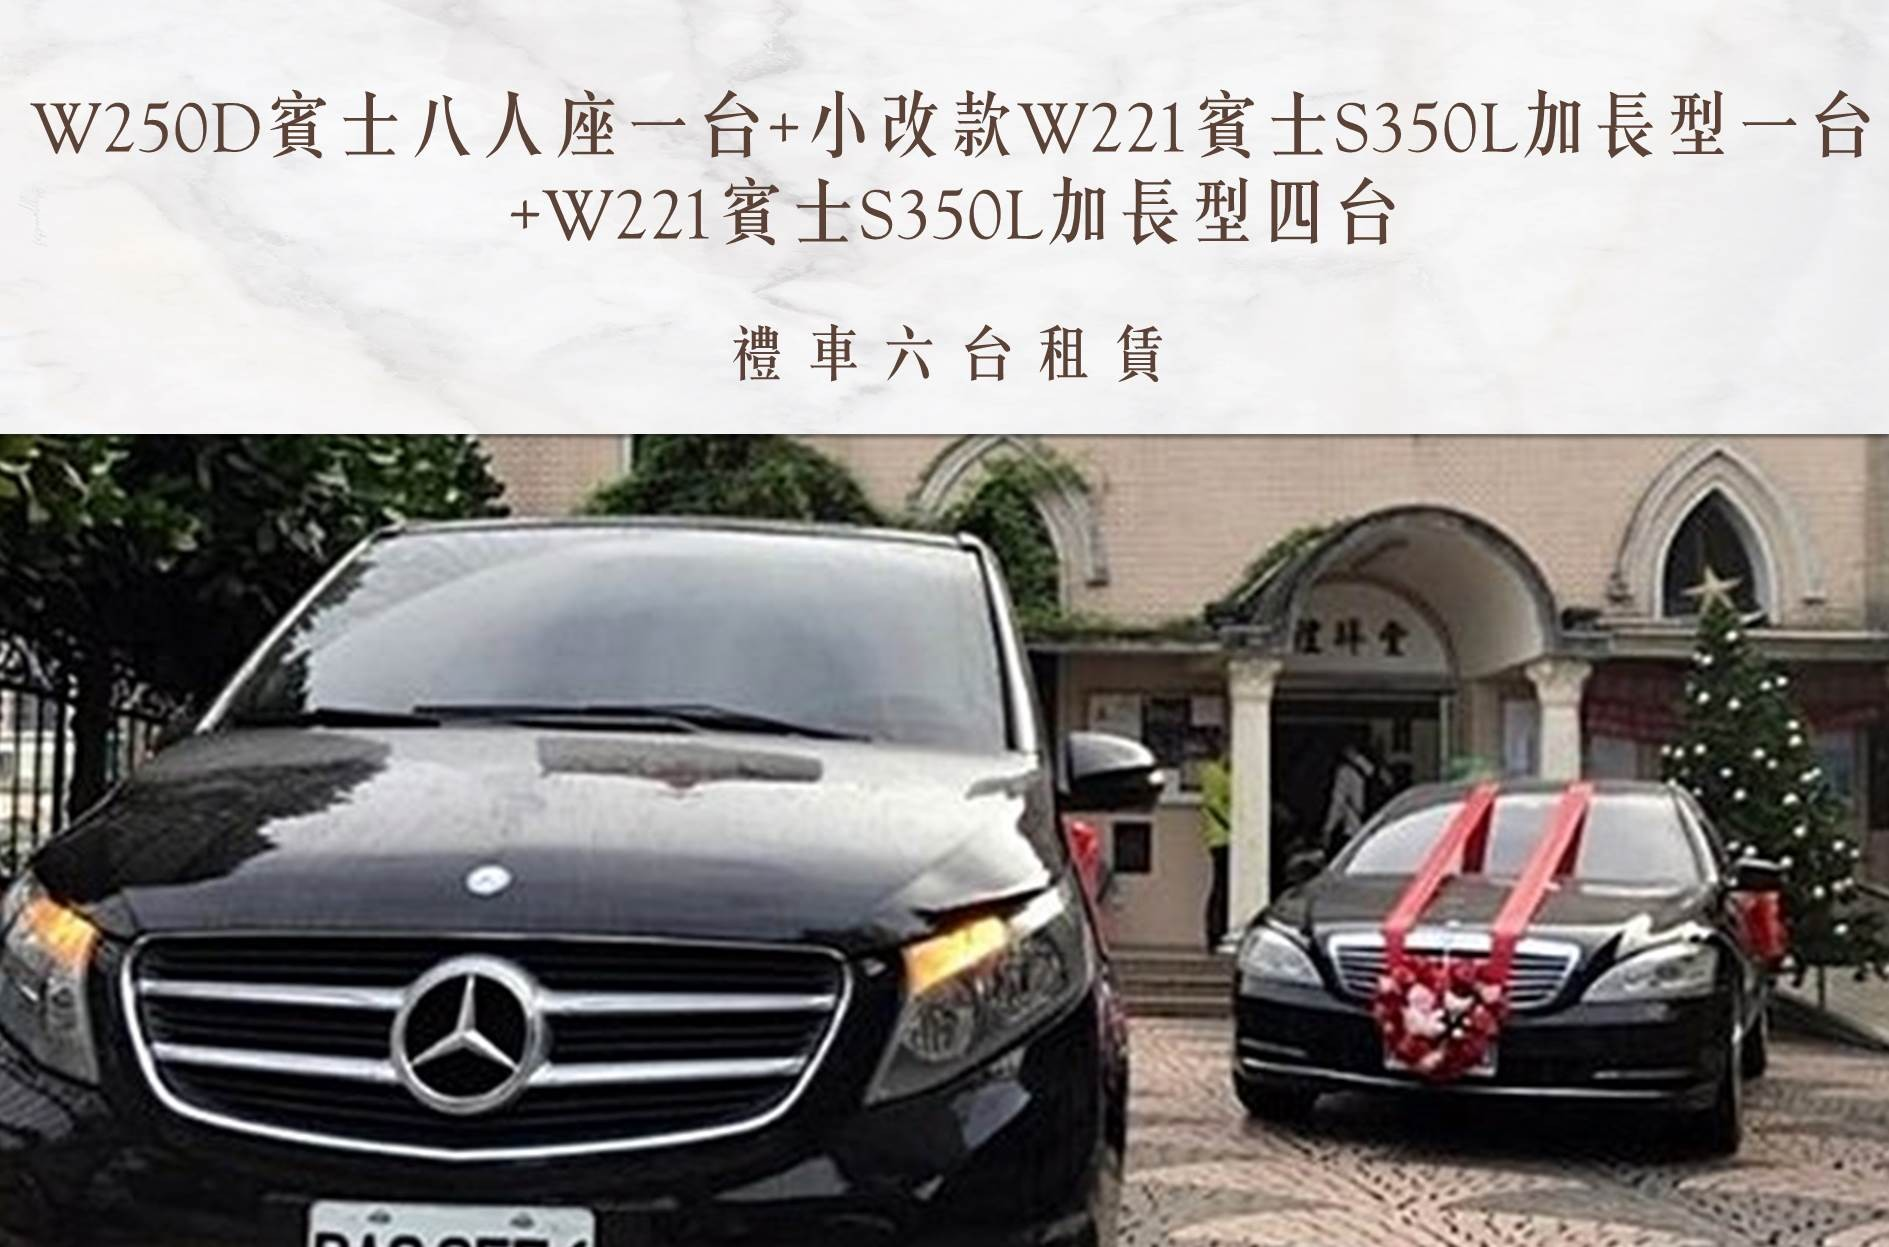 W250D賓士八人座一台+小改款W221賓士S350L加長型一台+W221賓士S350L加長型四台